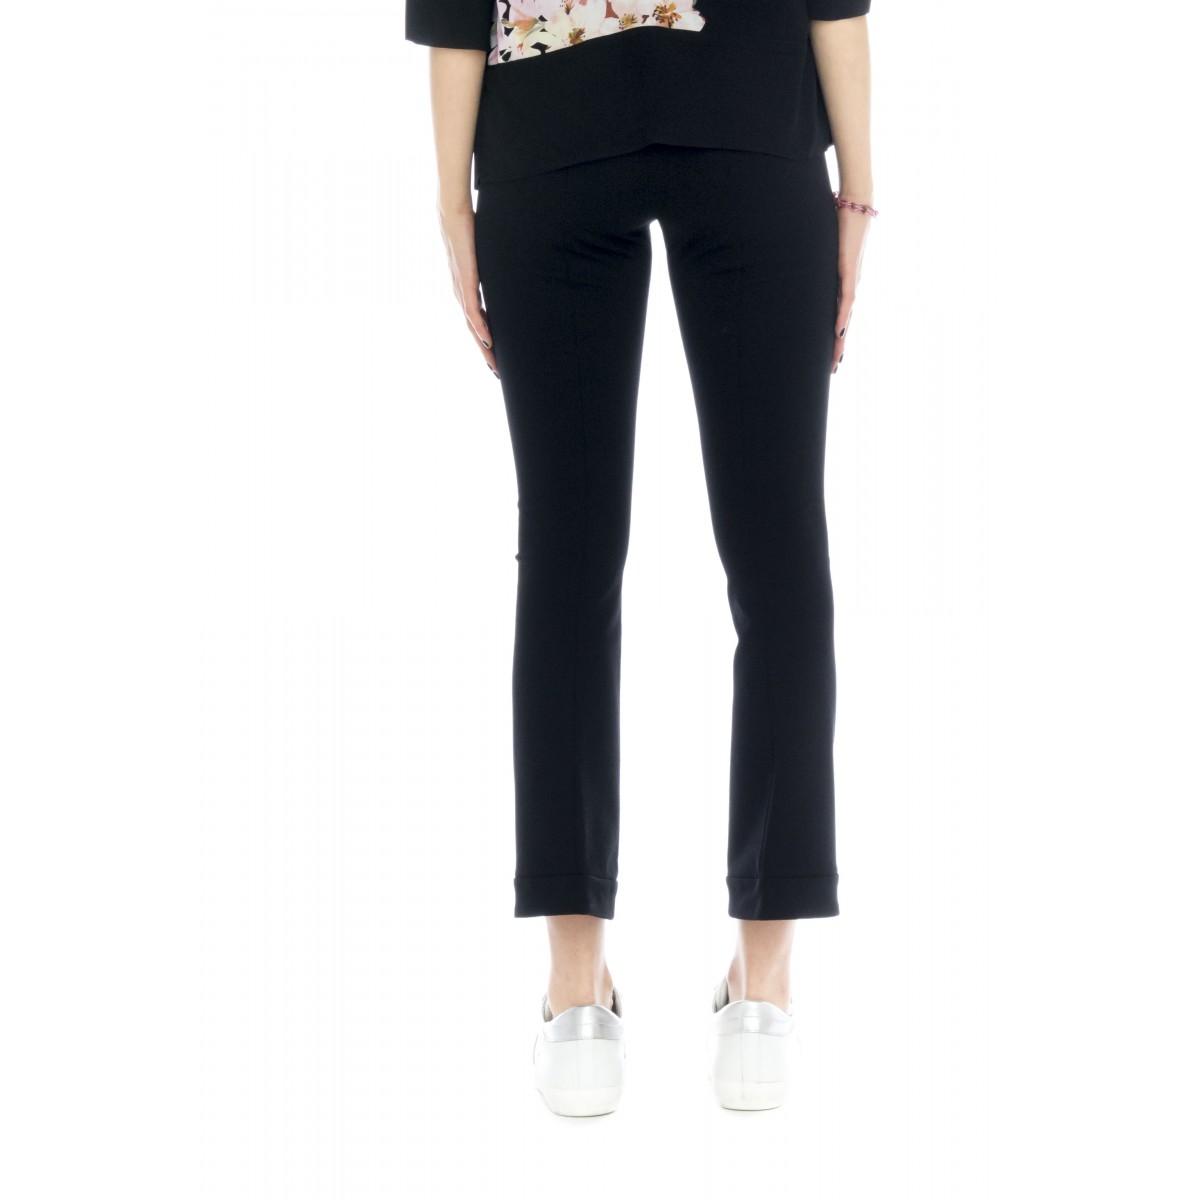 Pantalone donna - 2424 pantalone punto milano elastico